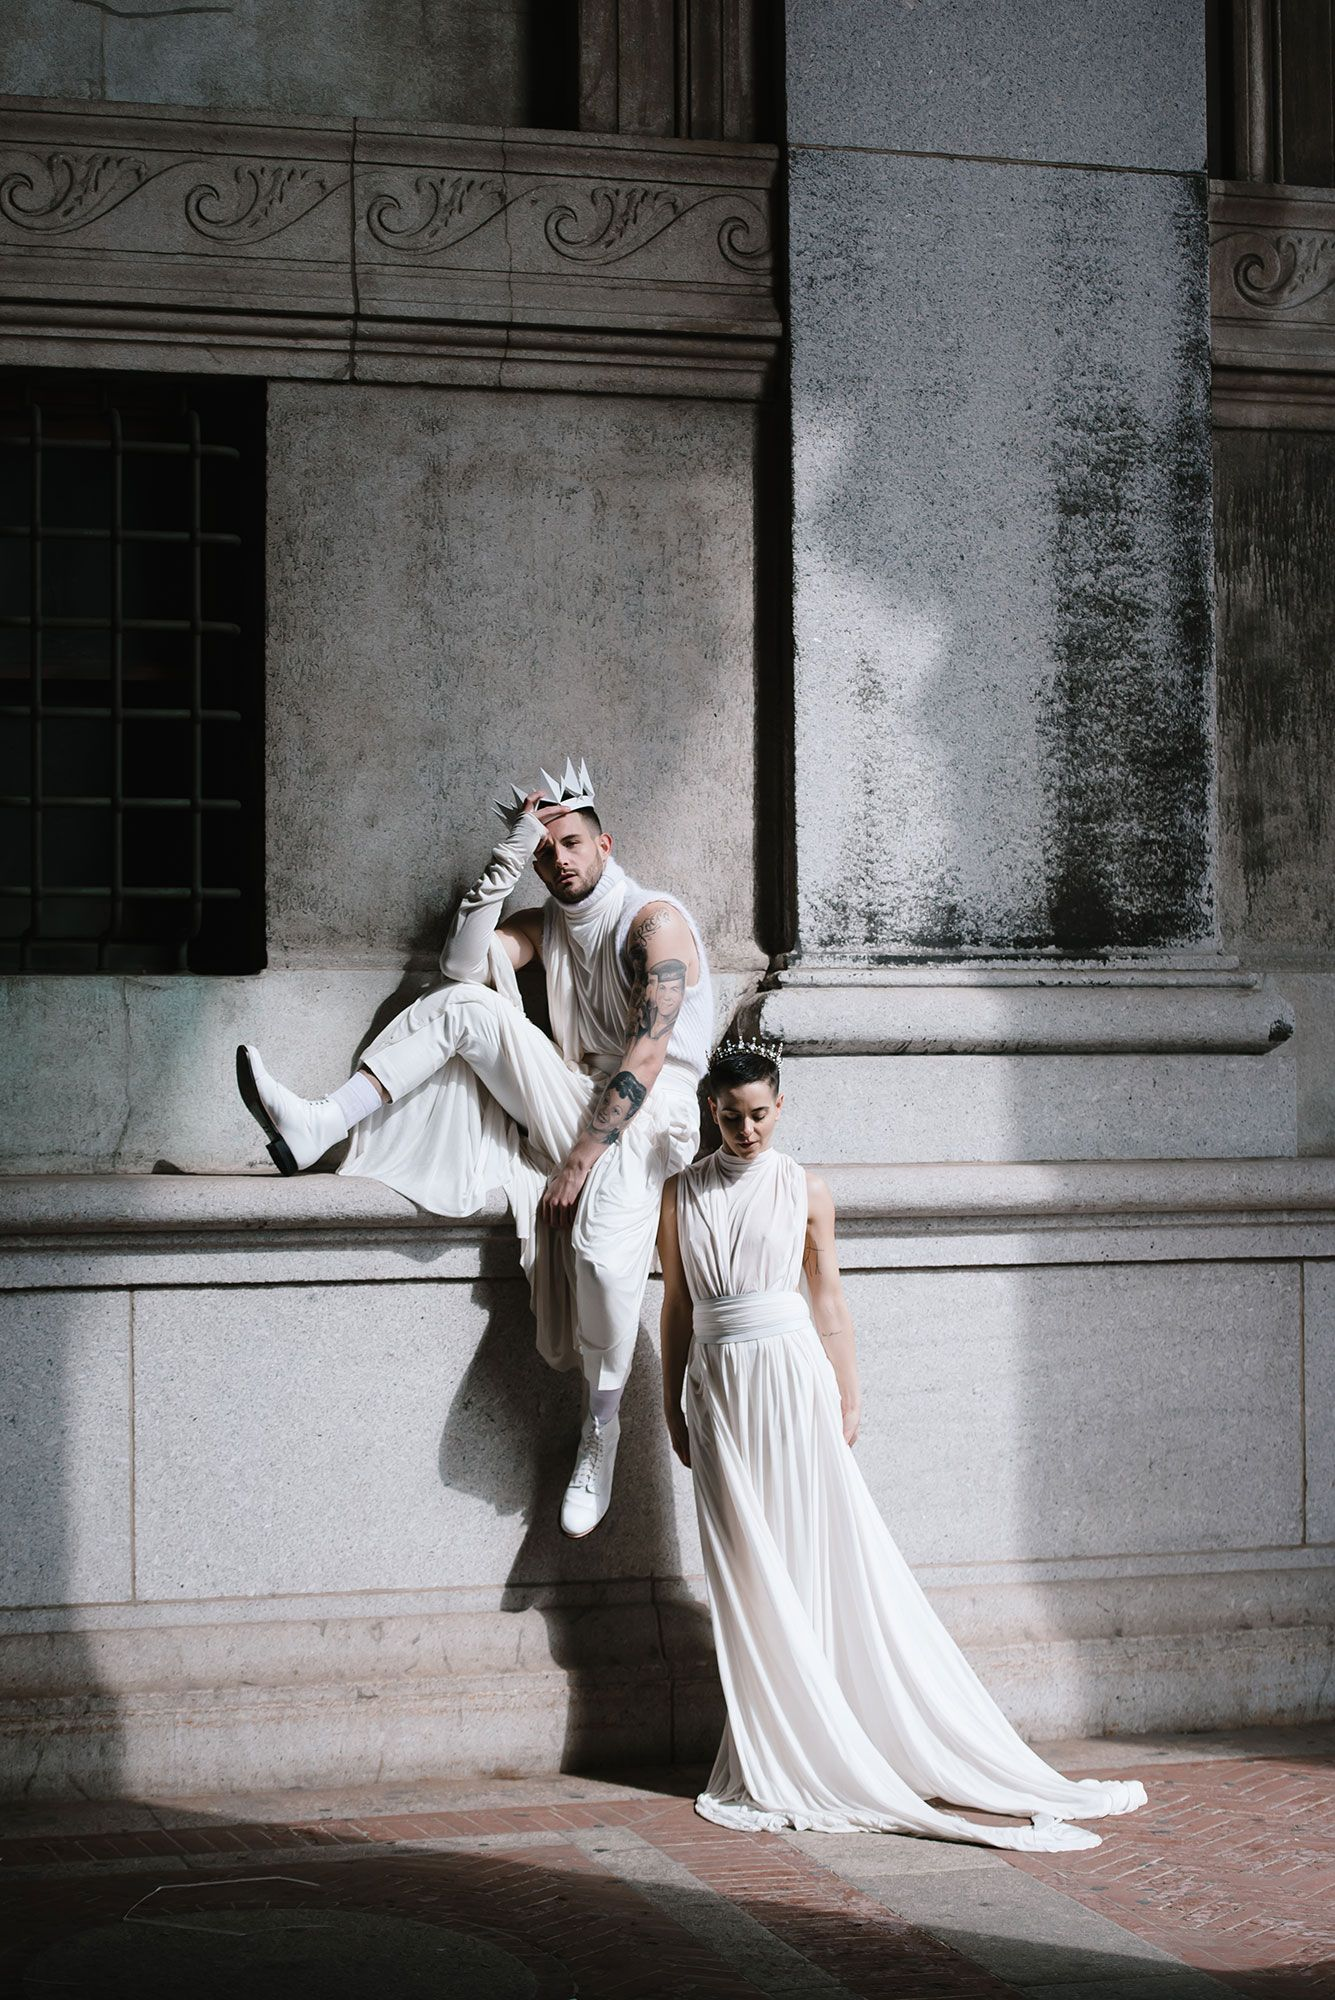 Leslie knope wedding dress  Youngerus Nico Tortorella Got Married ufor Realu to Partner in